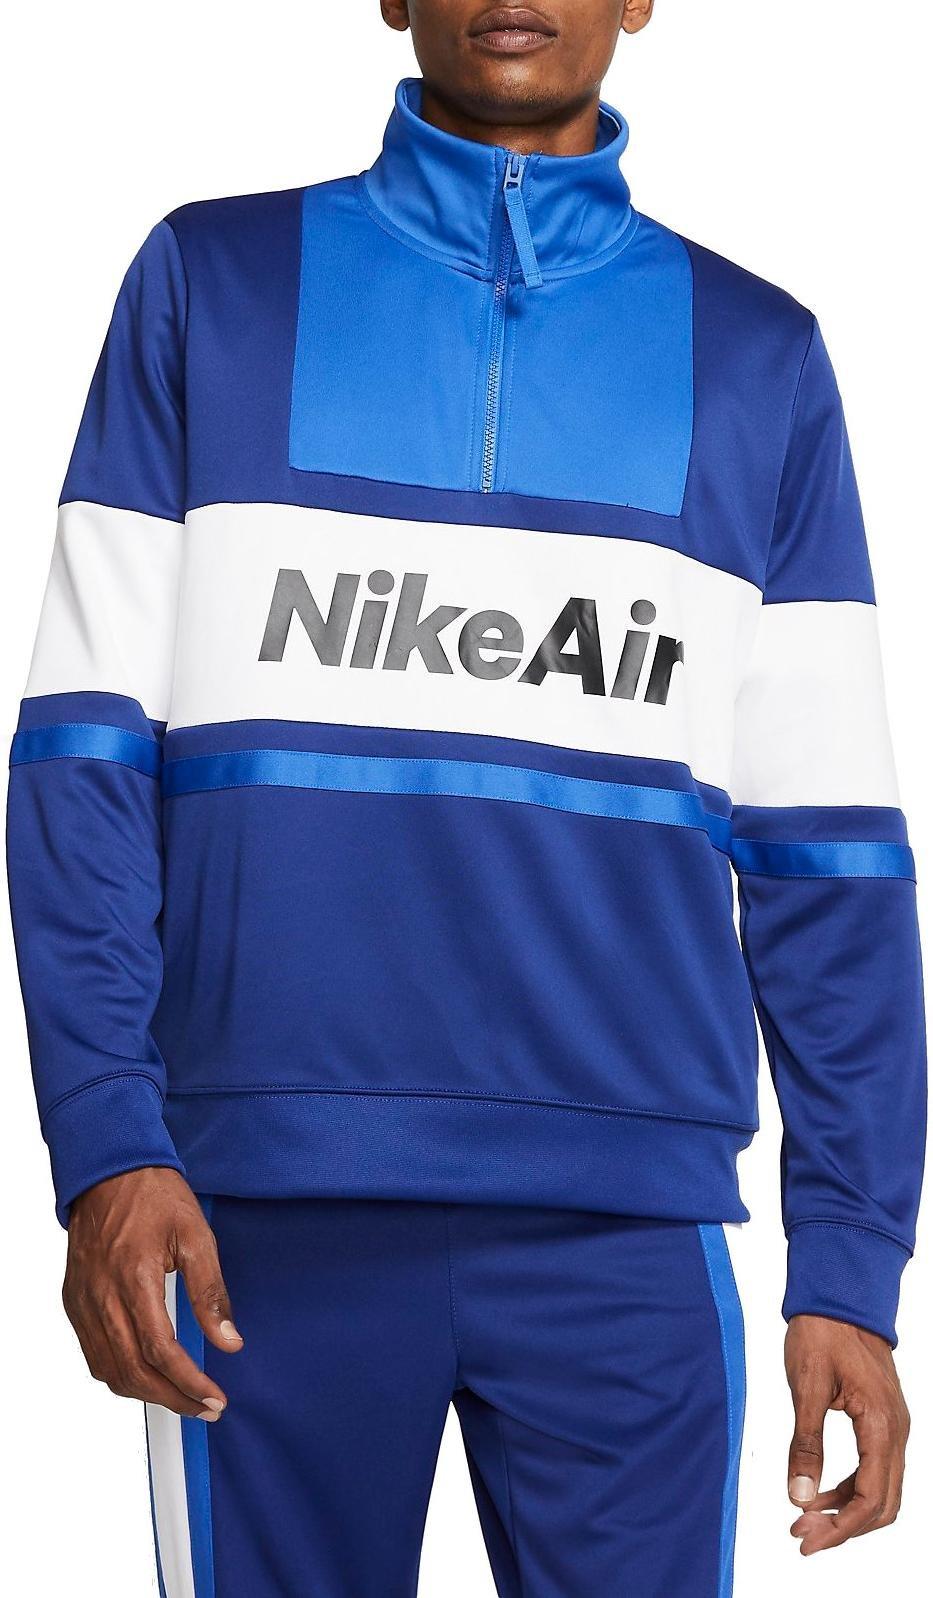 Pánská bunda se čtvrtinovým zipem Nike Air